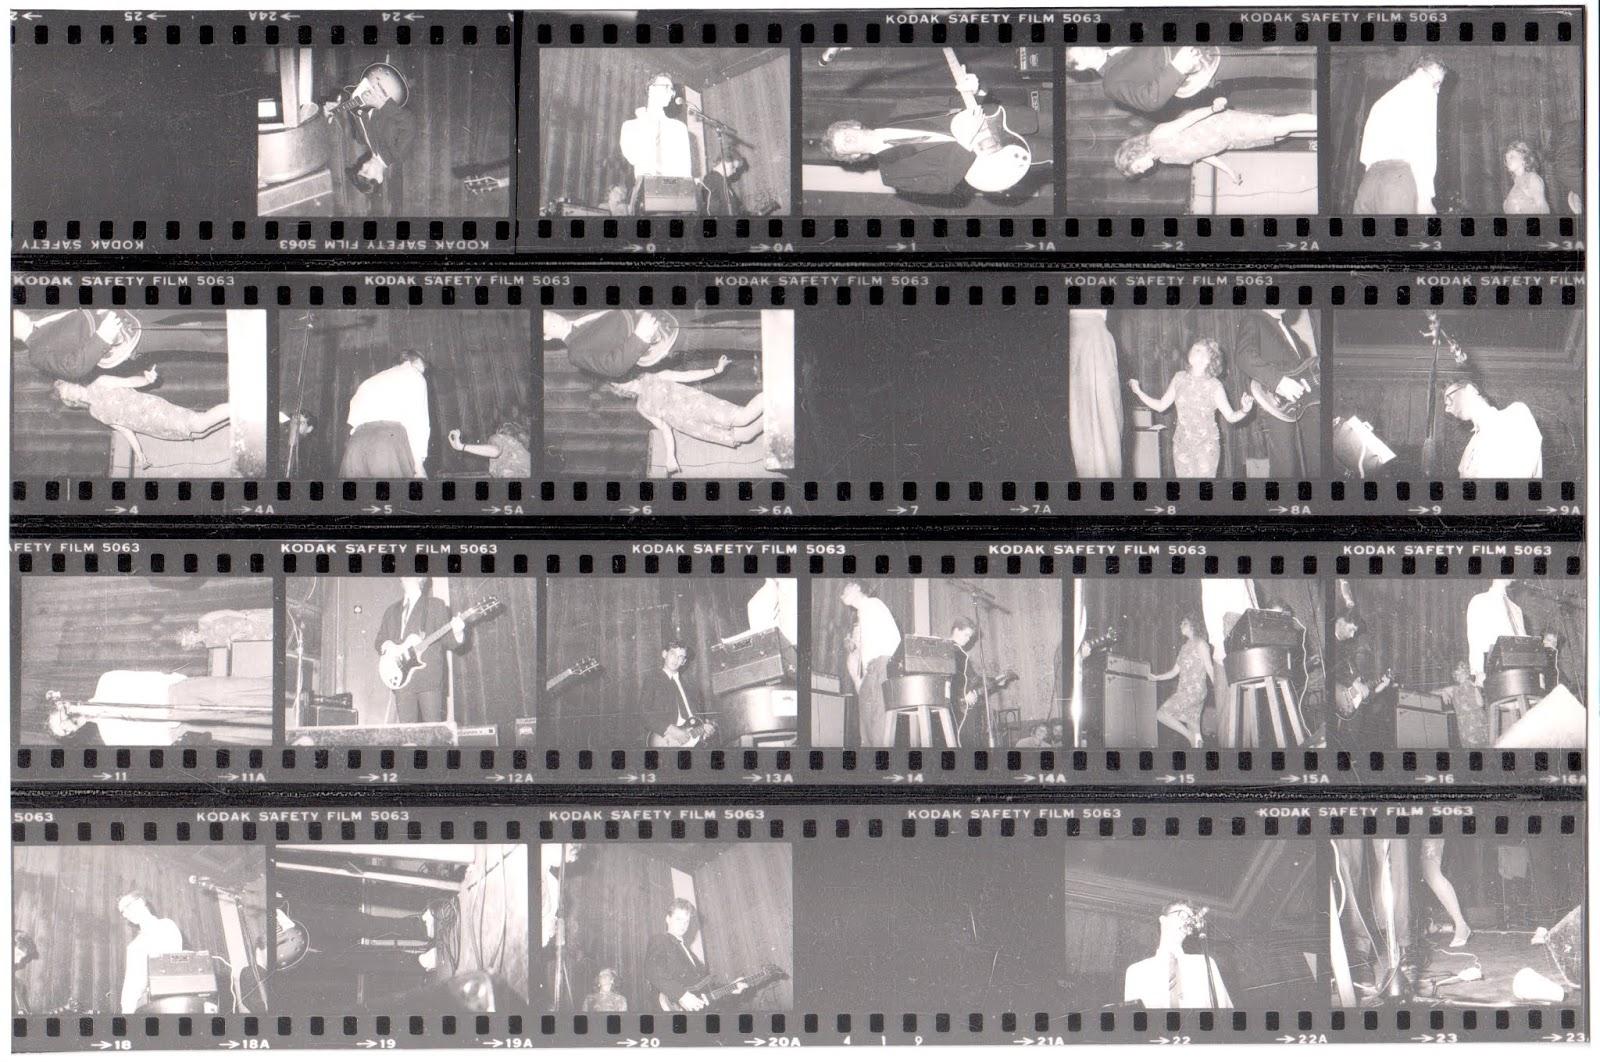 11 July 1979 - Paradiso, Amsterdam, Netherlands